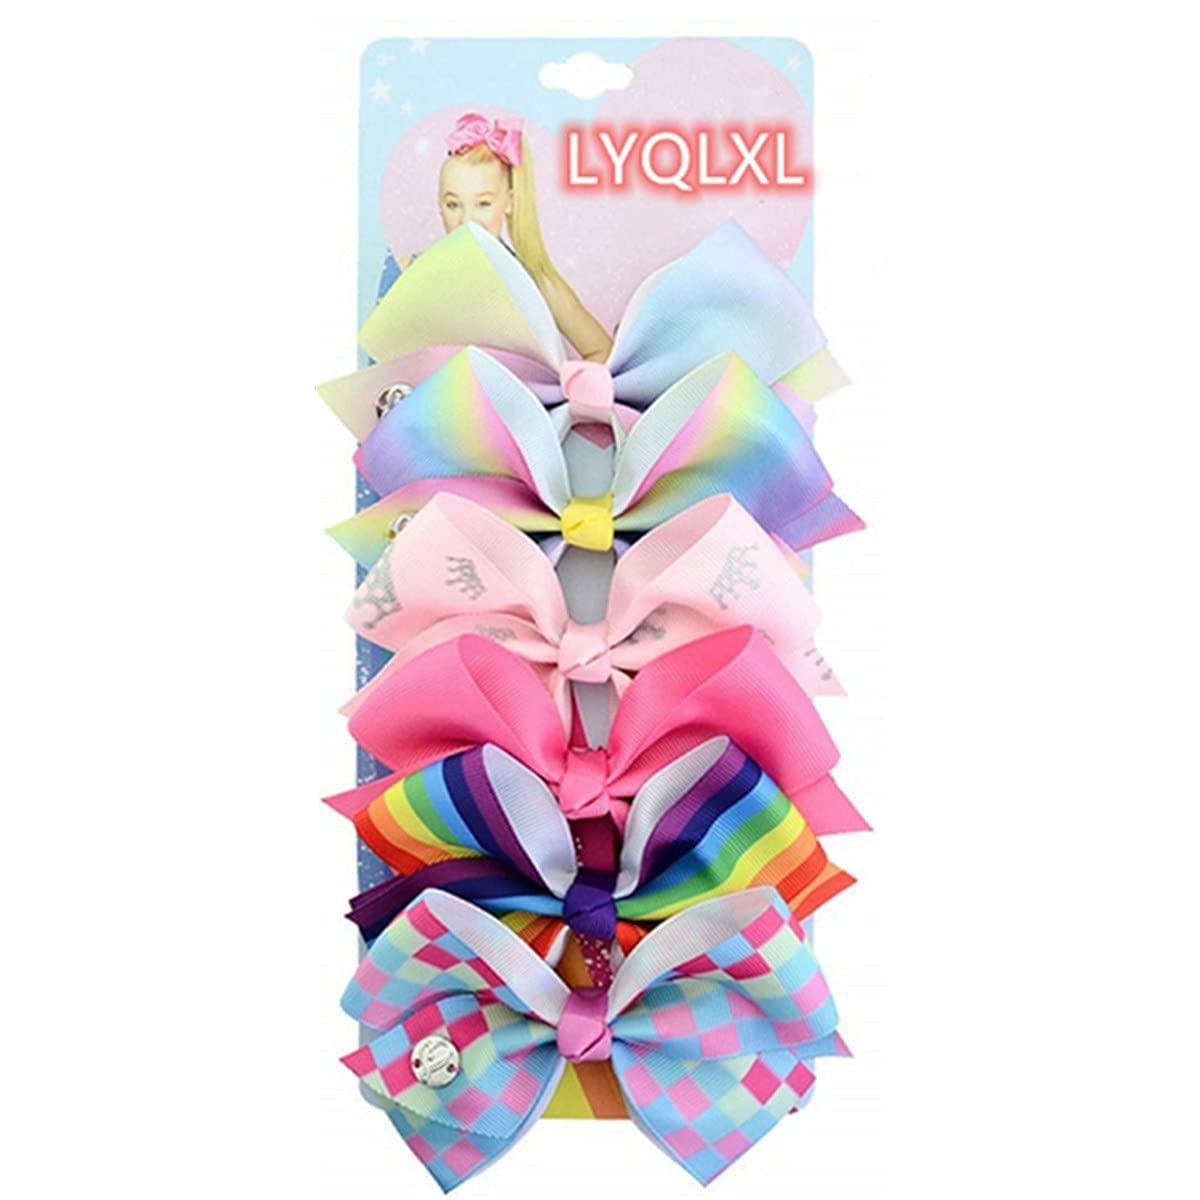 LYQLXL Hair Bows for Girls, 5